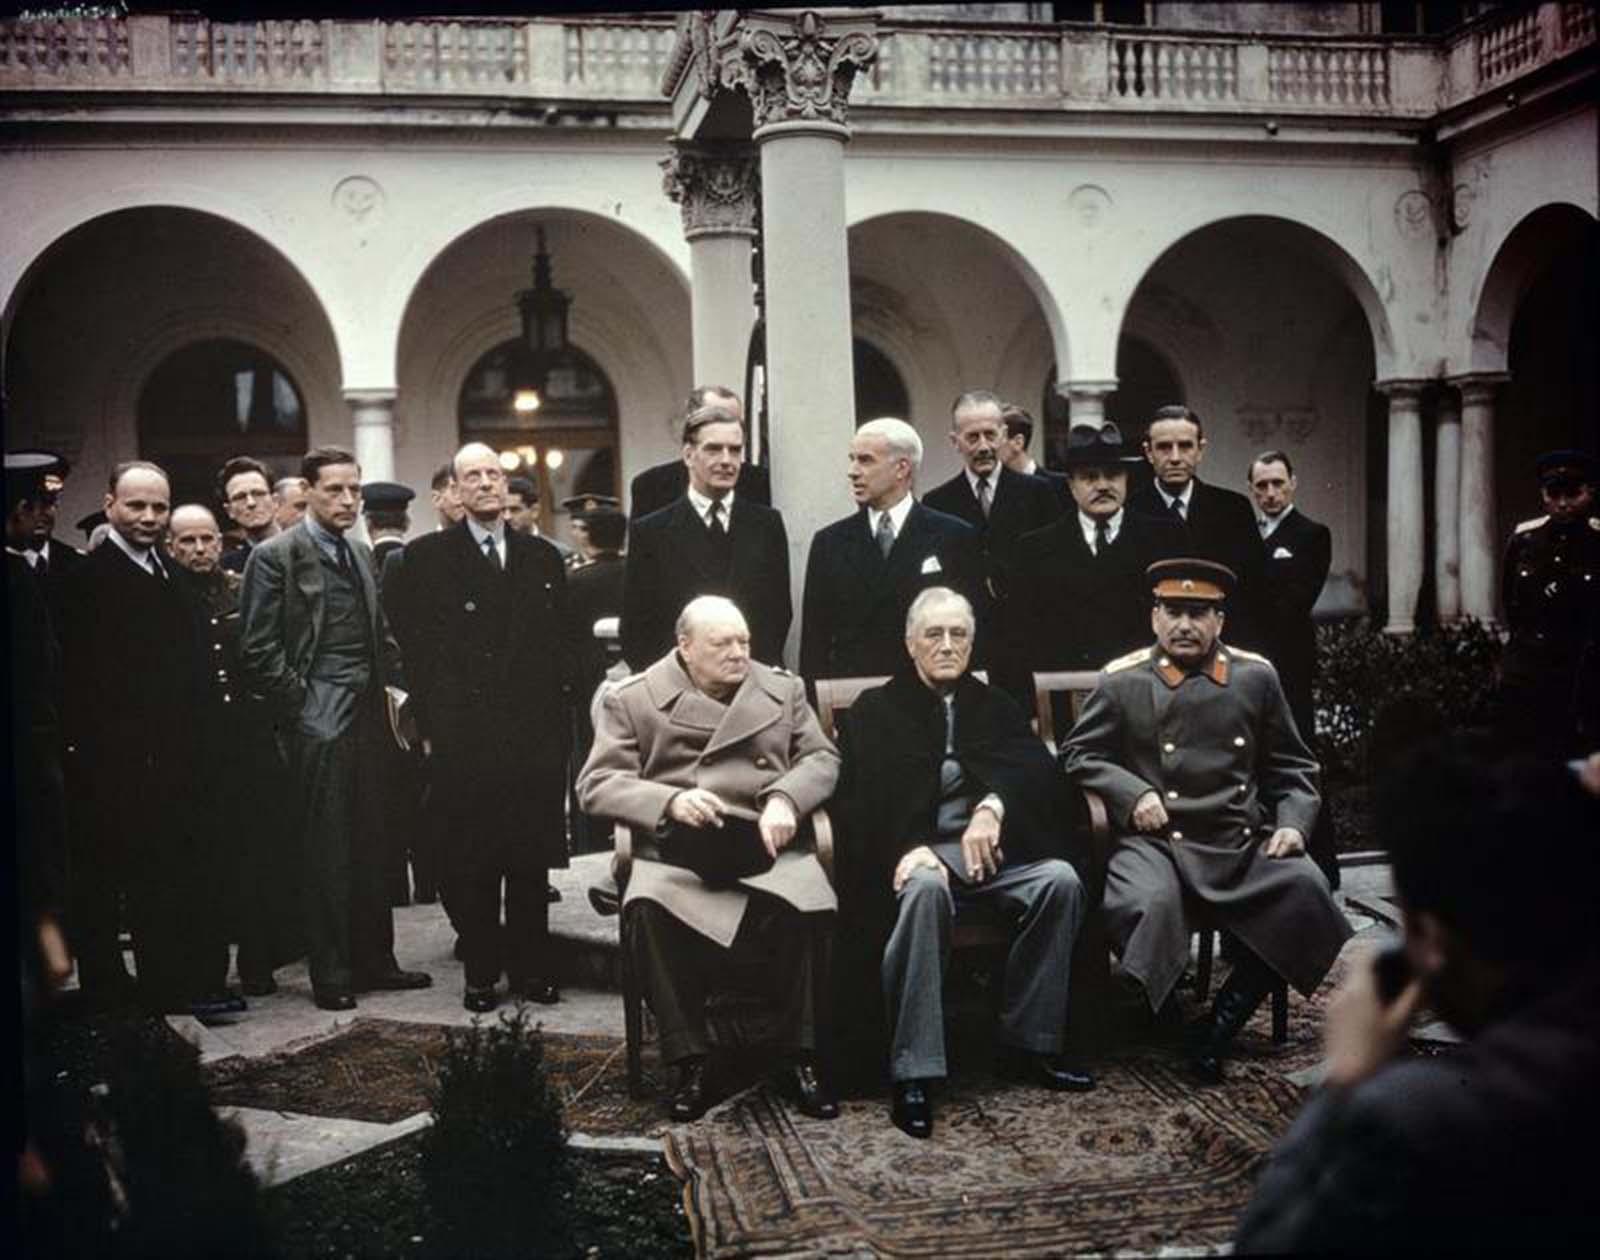 British Prime Minister Winston Churchill, U.S. President Franklin Roosevelt and Soviet leader Joseph Stalin during the Yalta Conference (Crimea). 1945.